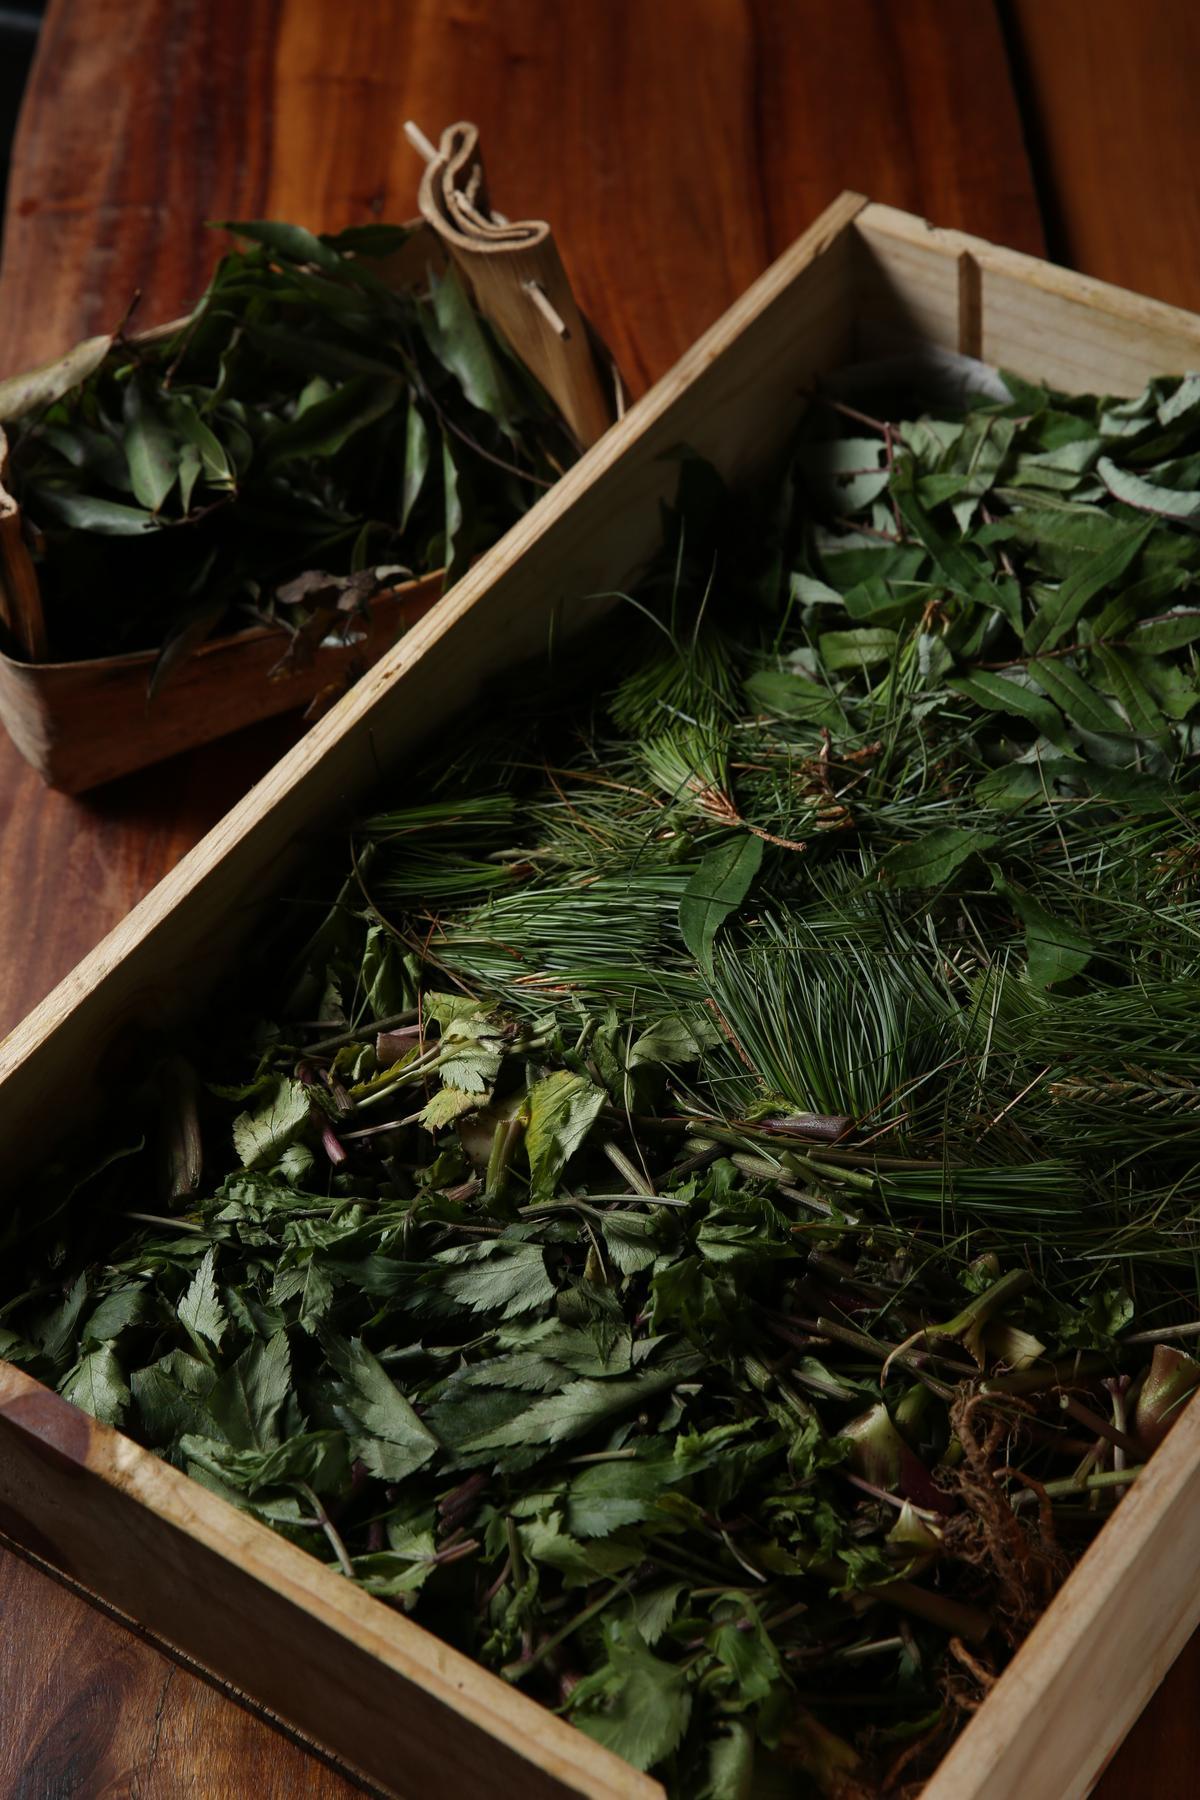 Akame不用外來香料,特別請人採集土肉桂、土當歸、五葉松、刺蔥等原生種香草植物。